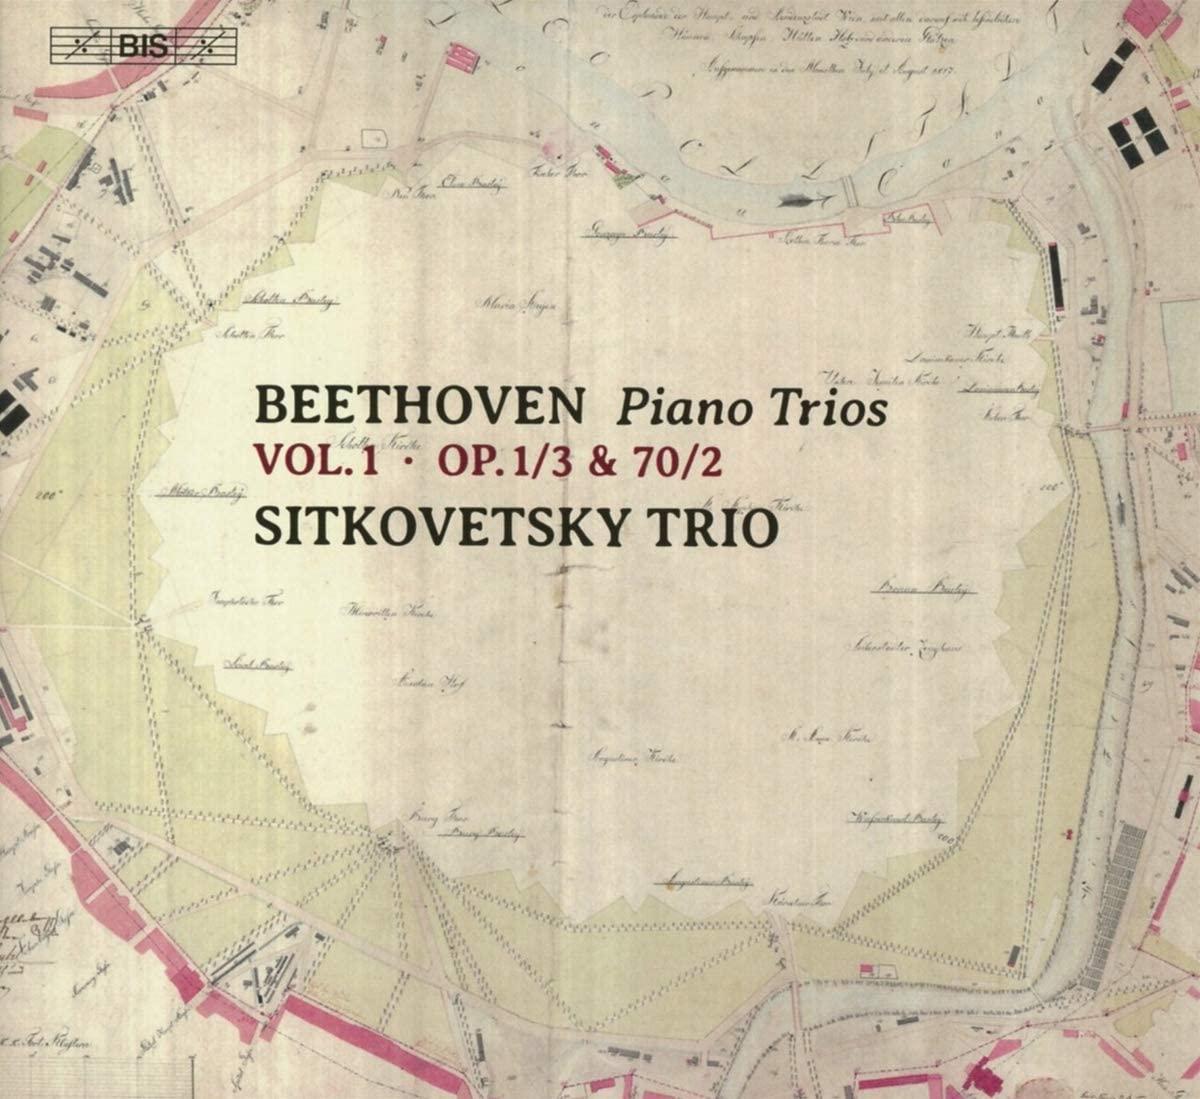 Review of BEETHOVEN Piano Trios, Vol 1 (Sitkovetsky Trio)